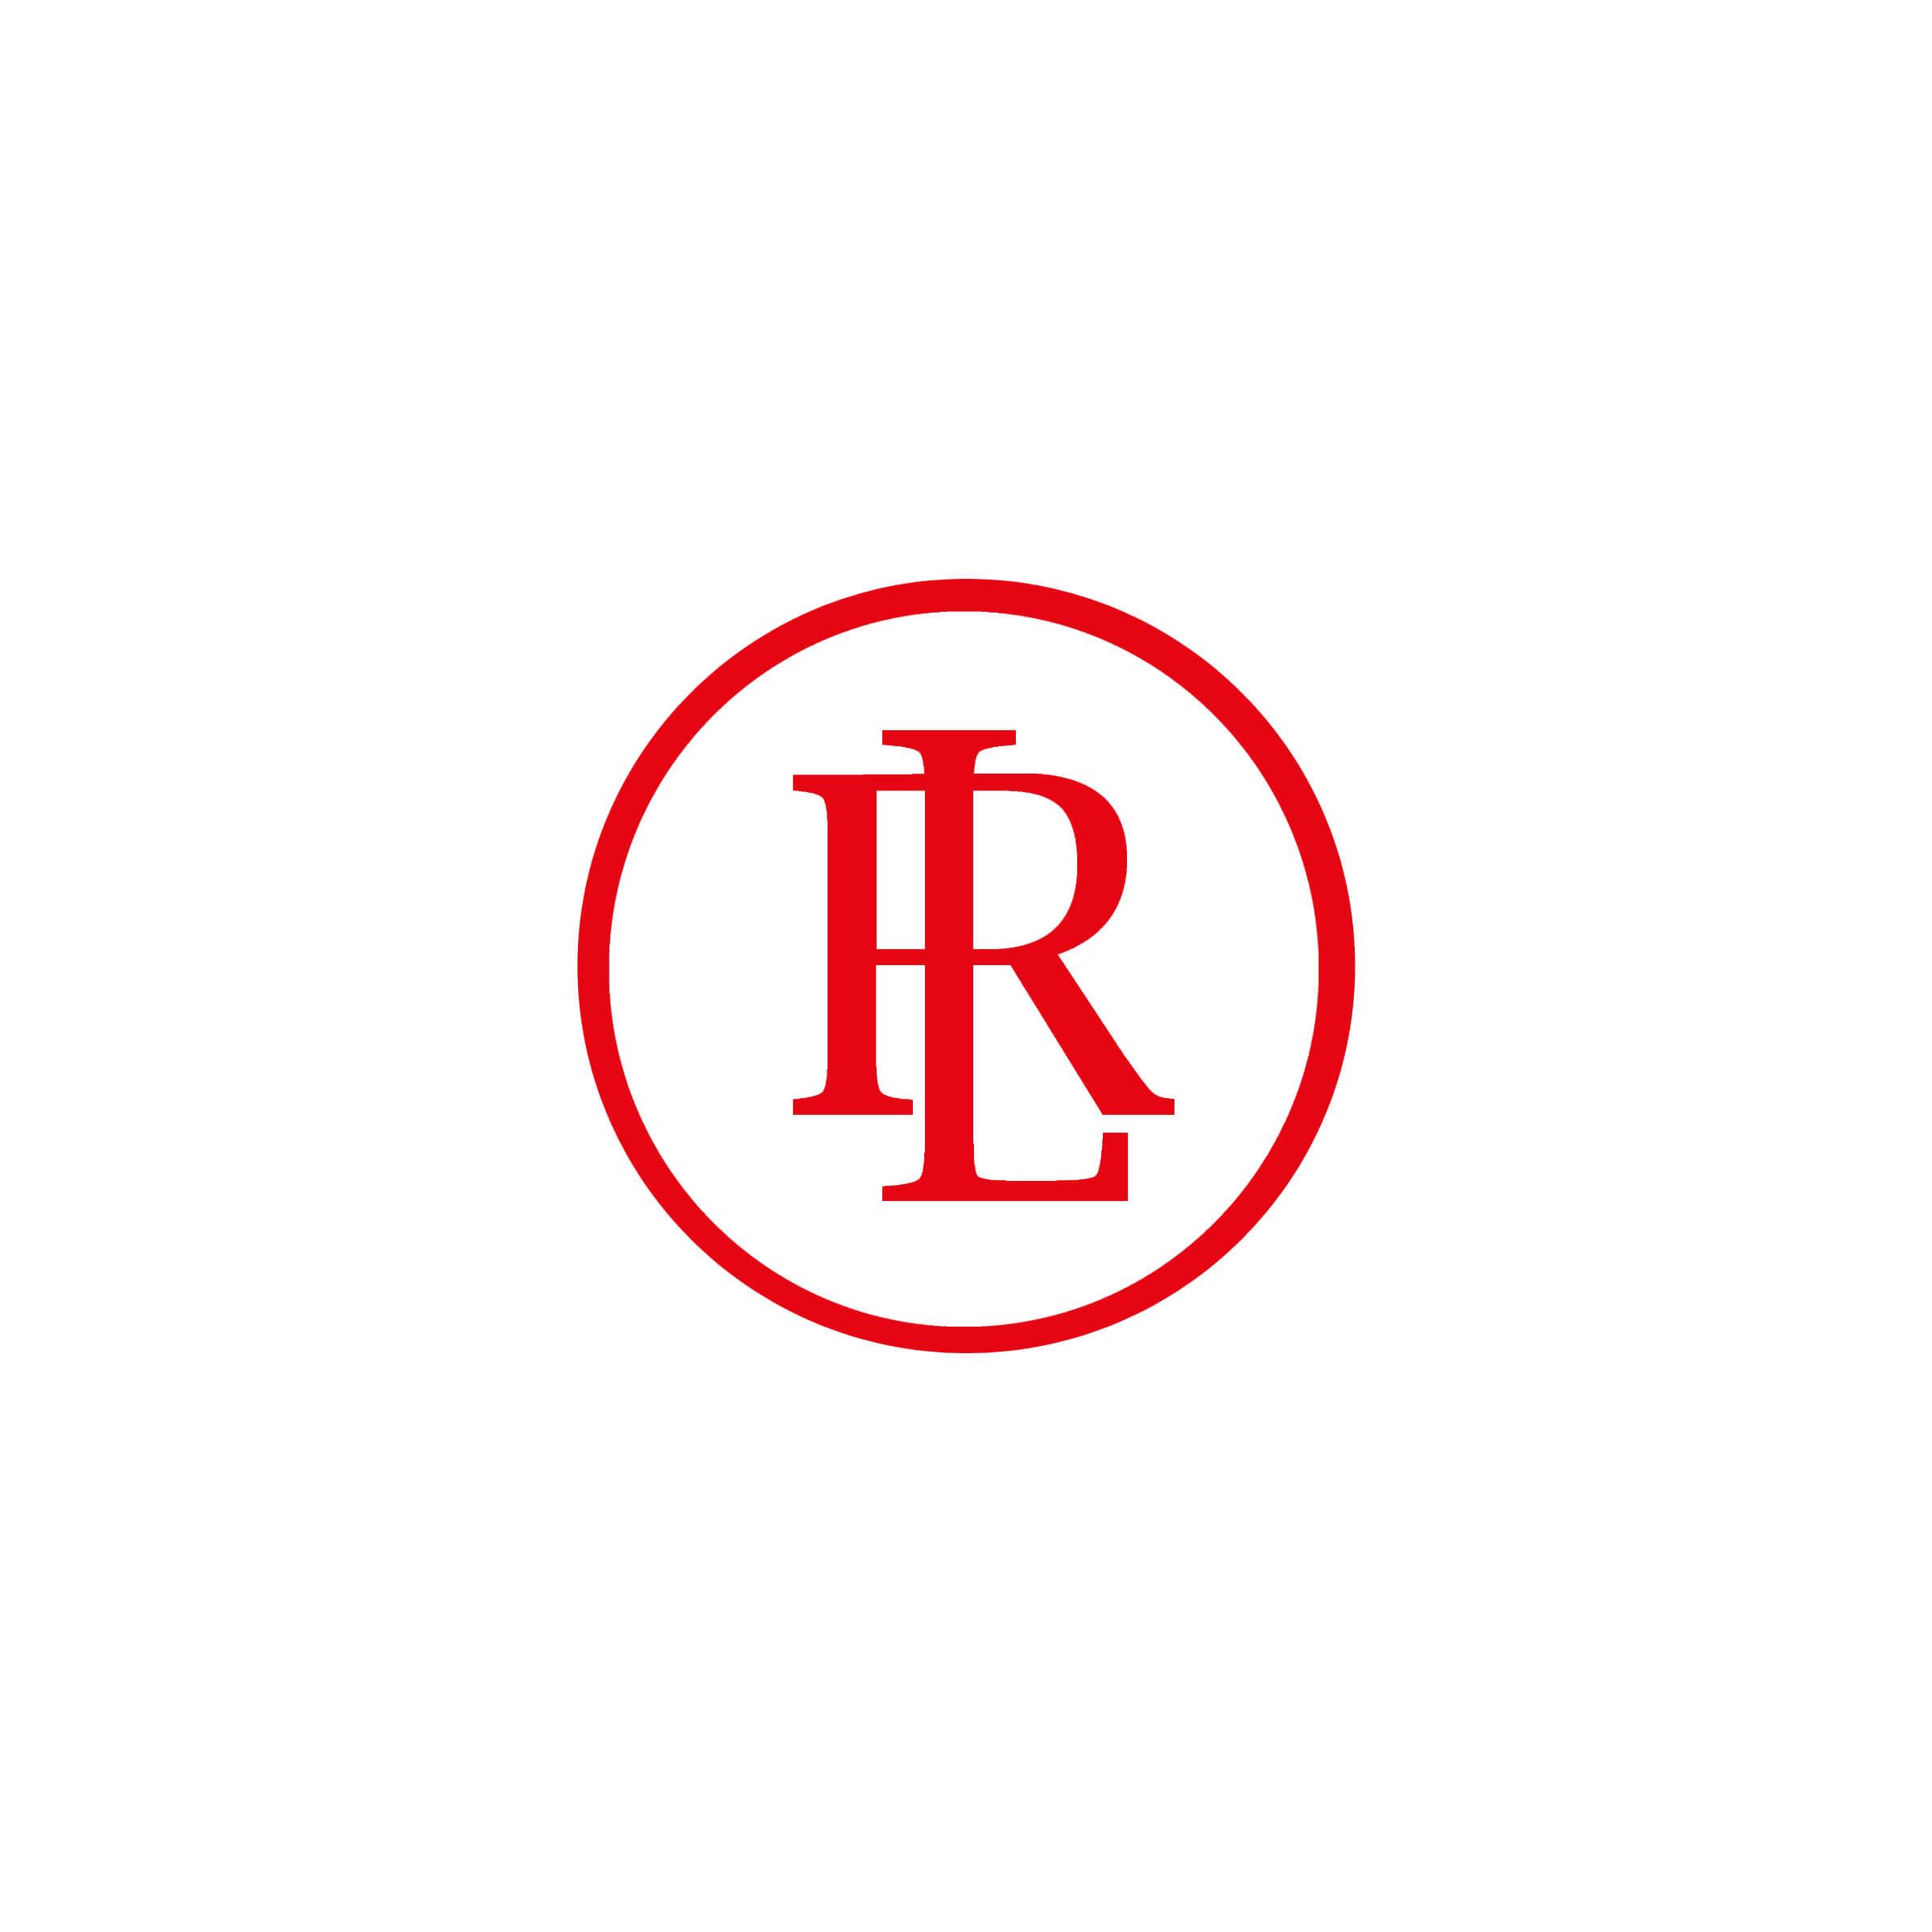 107 / C1 / Aygo (3/5-drs) raammechaniek L (voor) (elb. inc. motor)